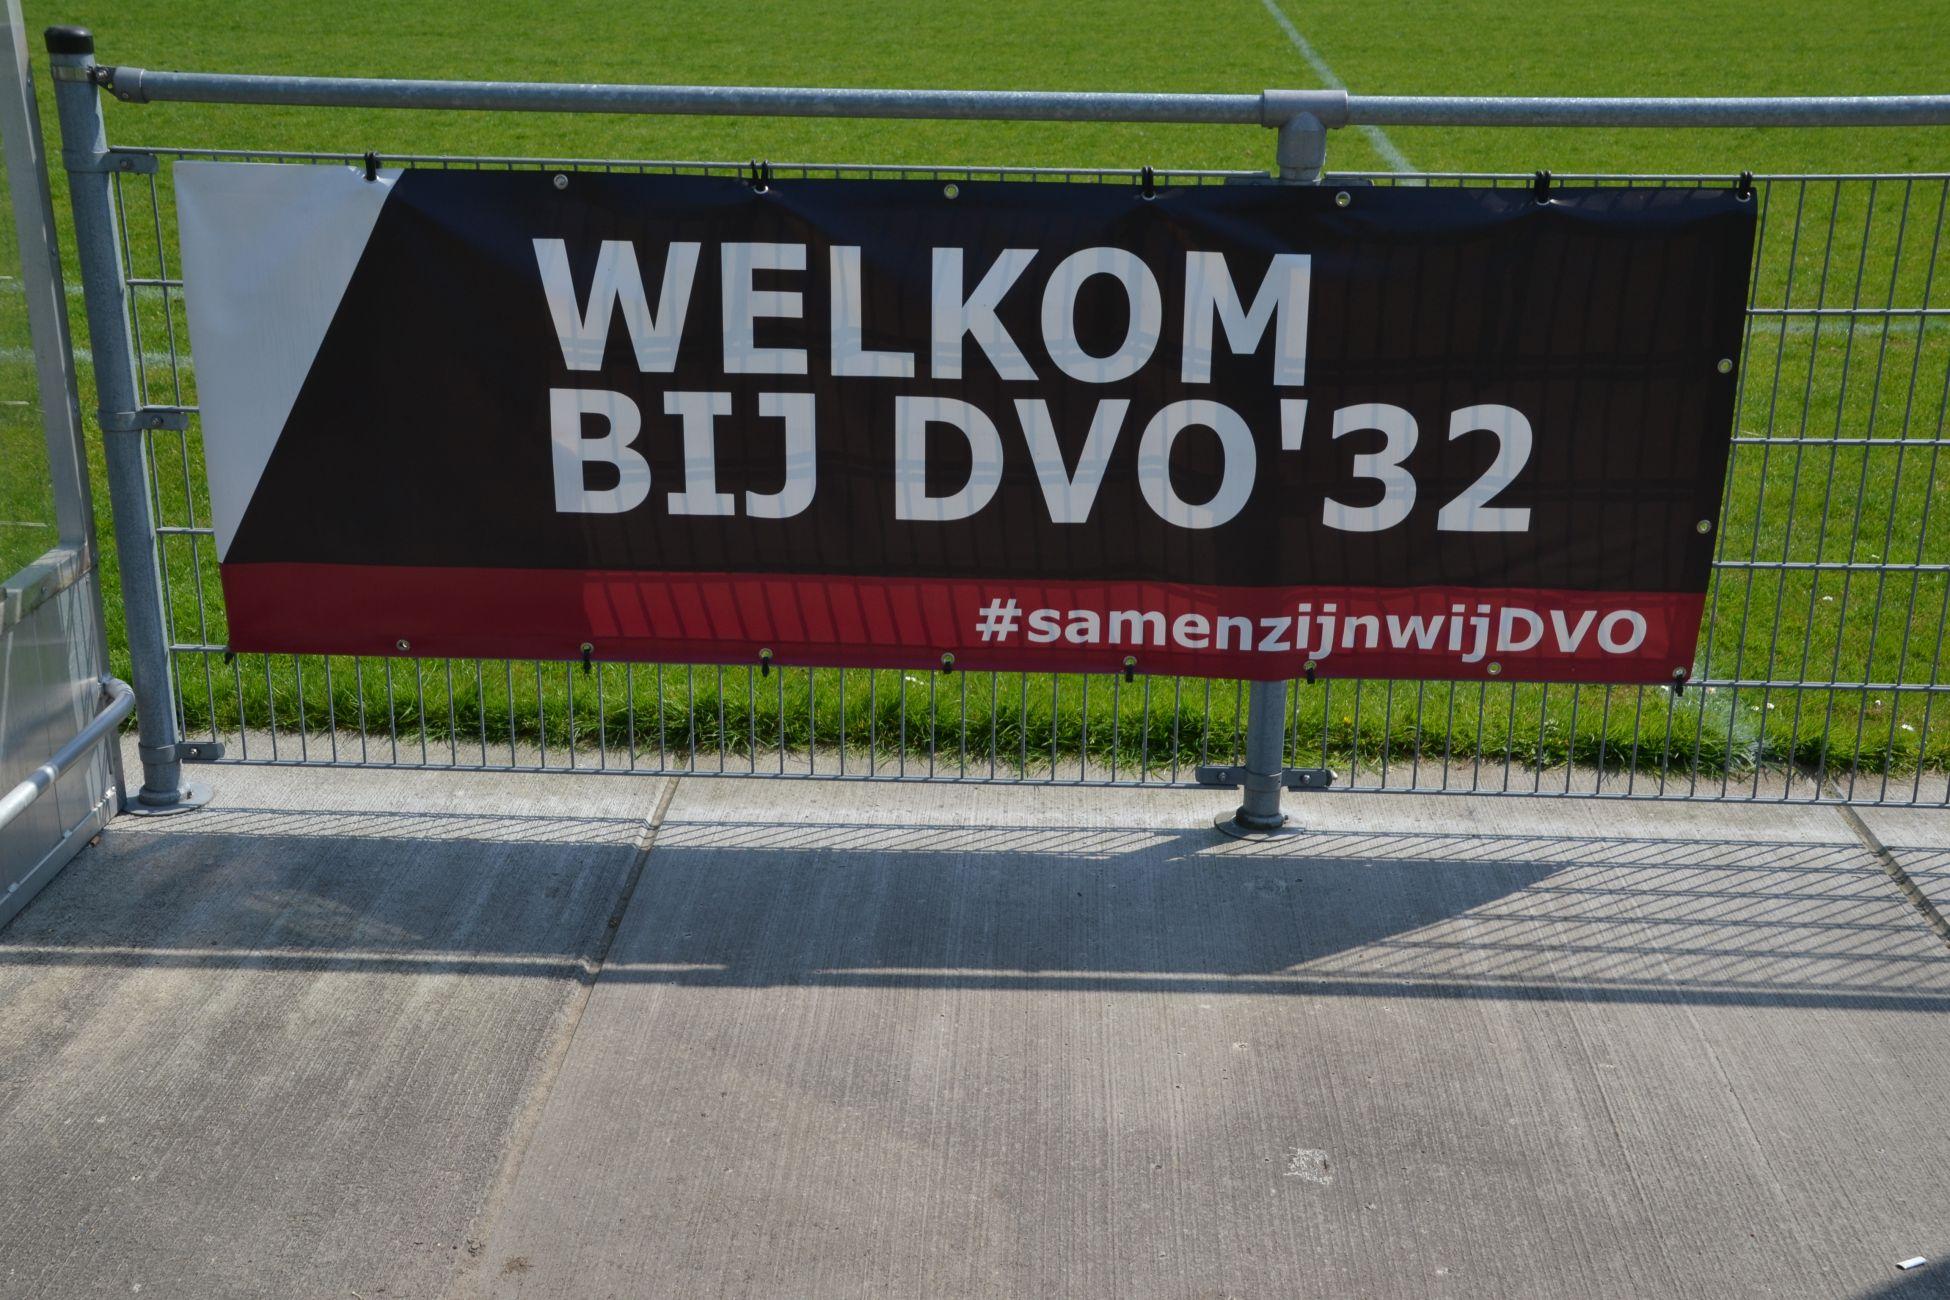 DVO'32 doet plicht tegen Vierpolders